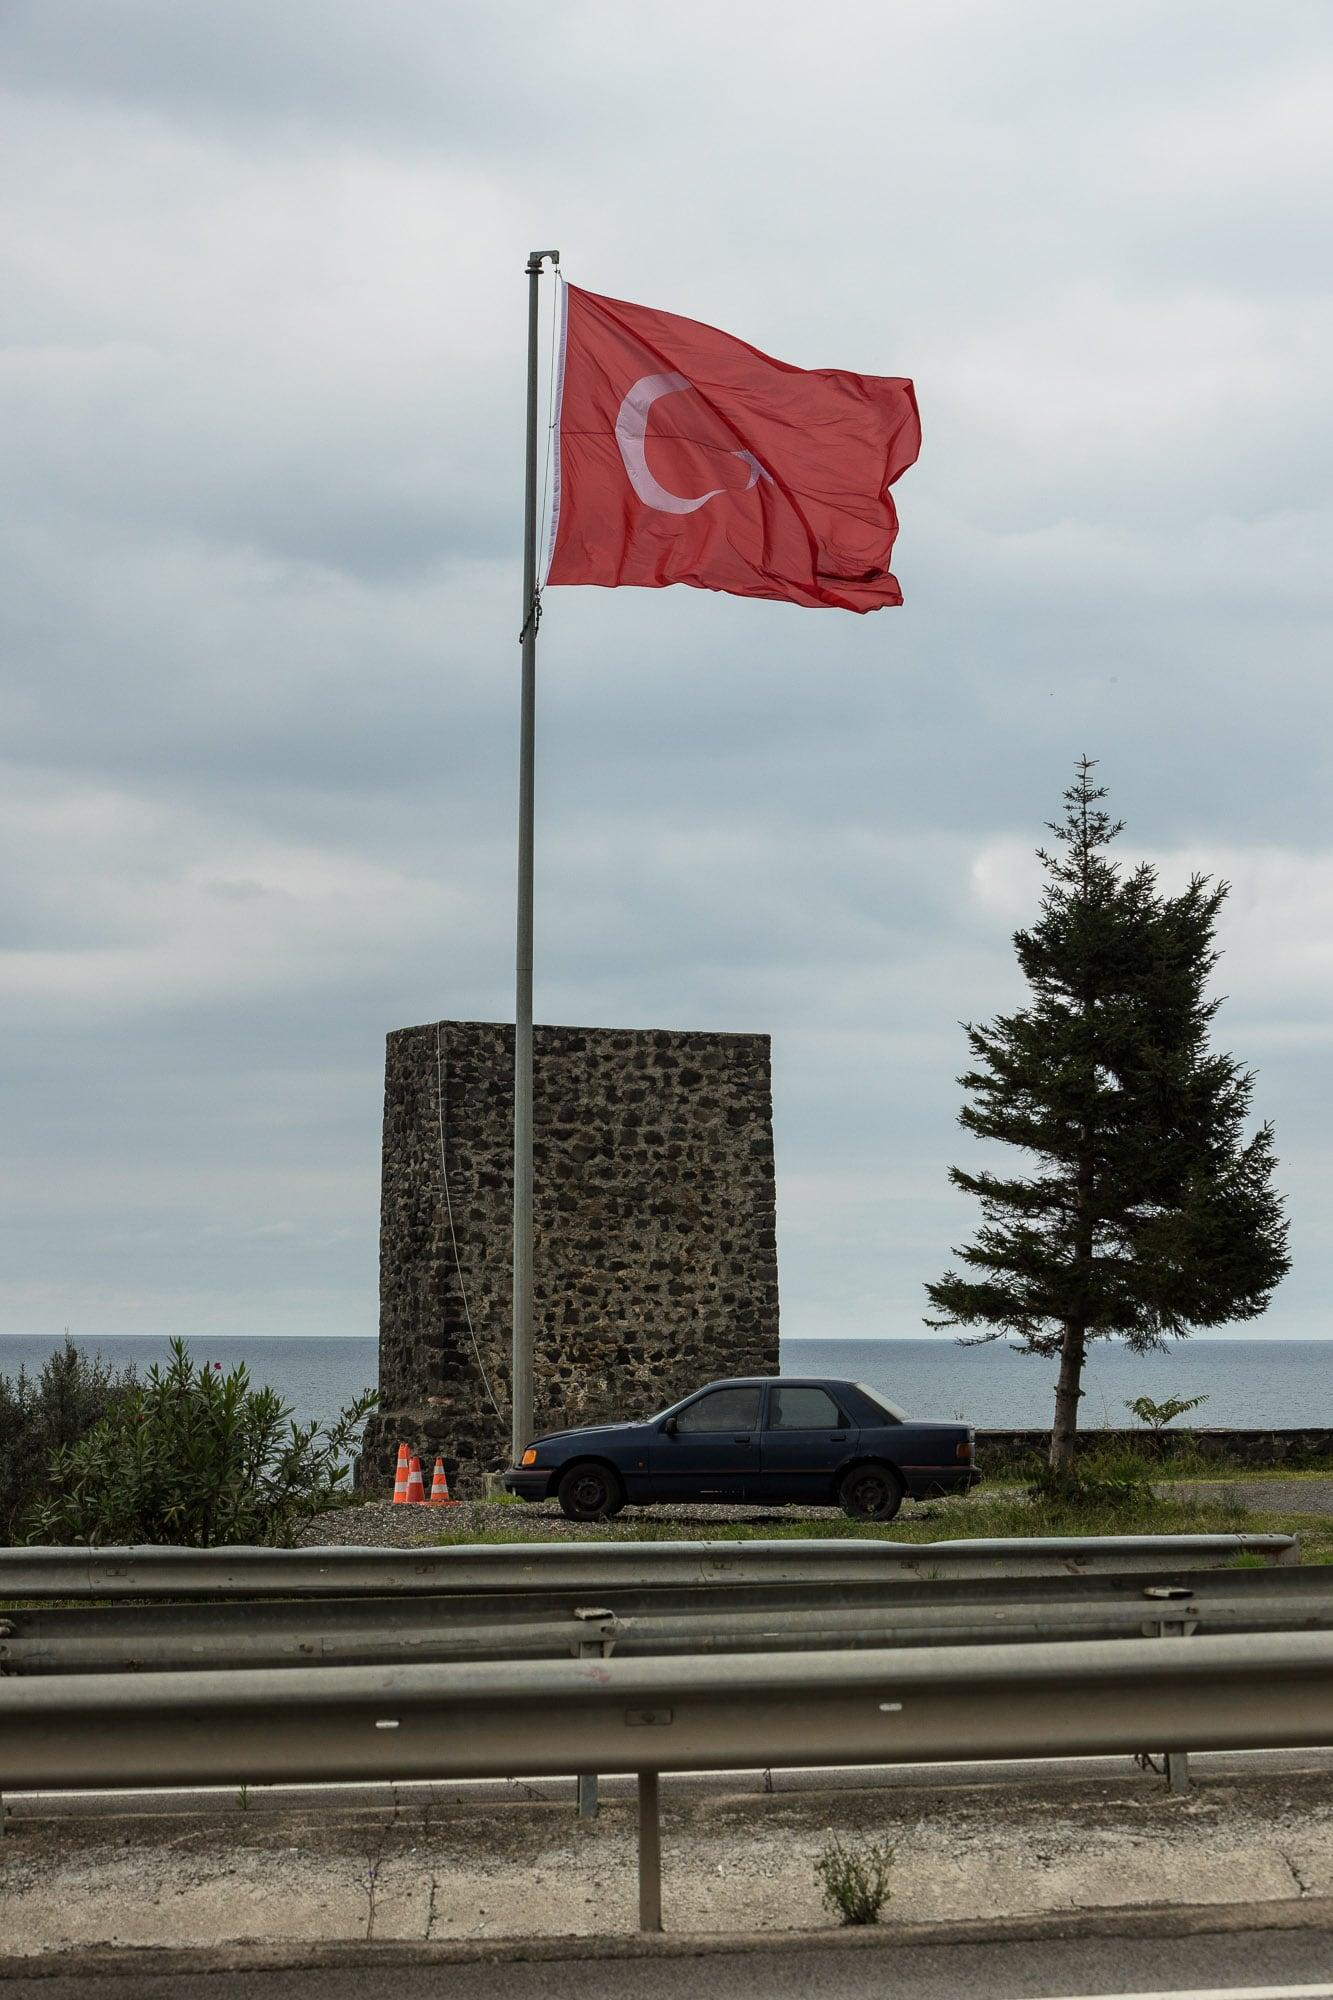 car with turkish flag